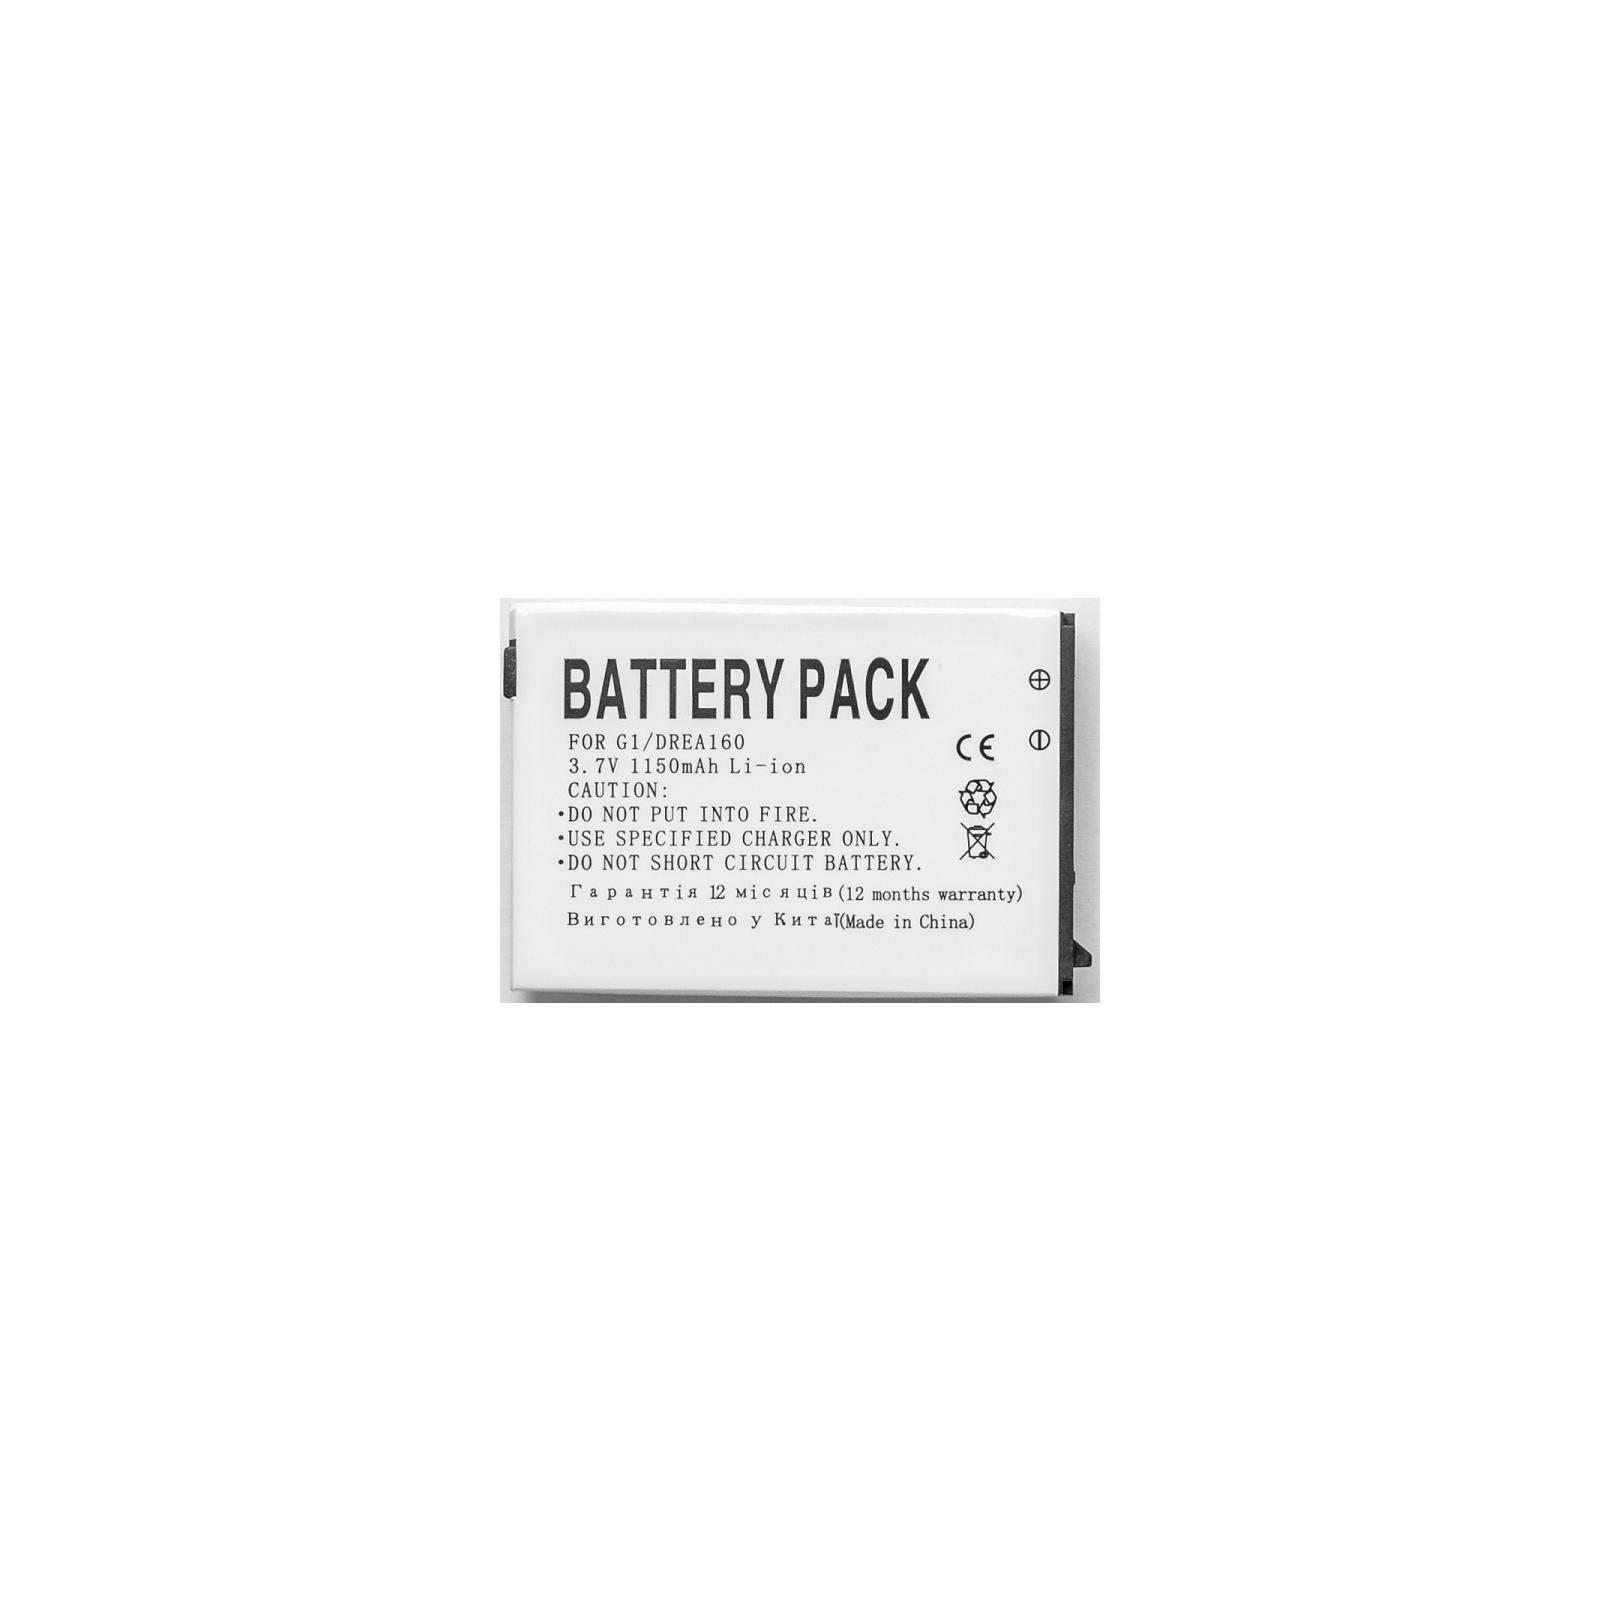 Аккумуляторная батарея PowerPlant HTC DREA160 (Google G1, Dream) (DV00DV6155) изображение 2